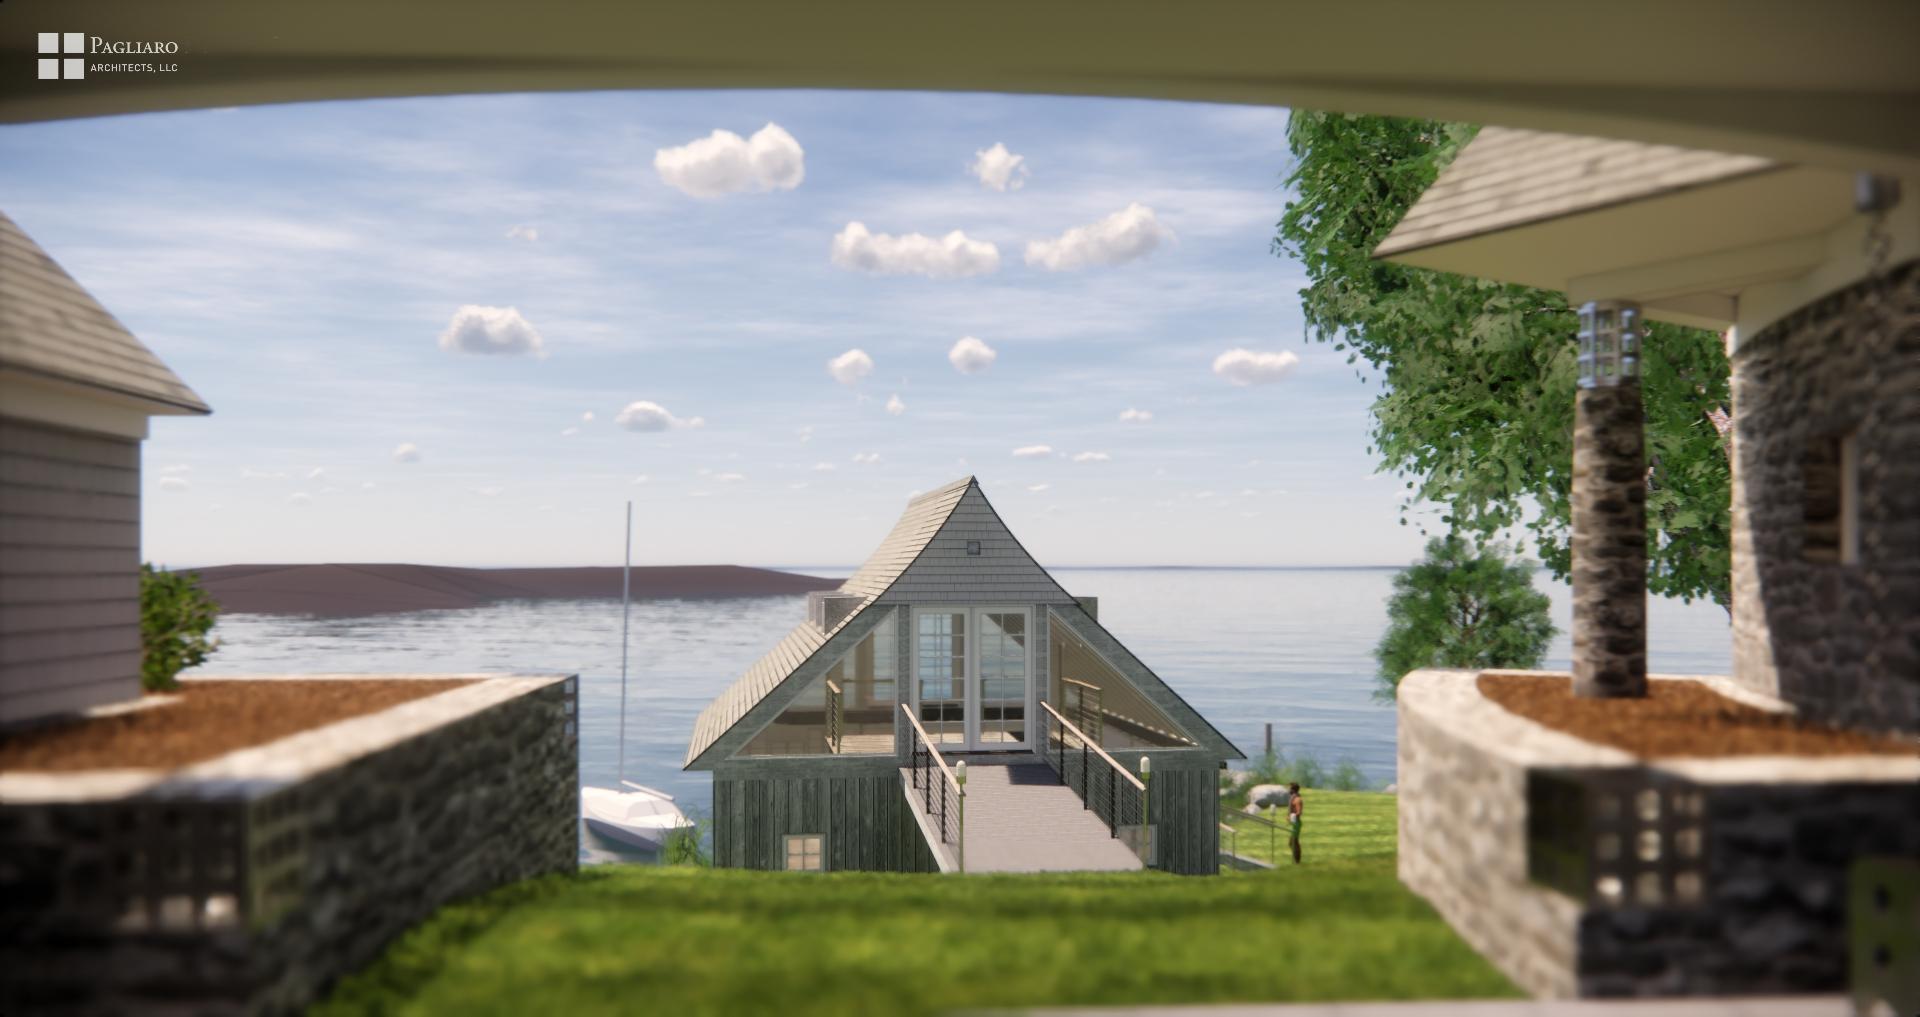 33-35 Money Point - 2019.07.10 Boat House Exterior 01.jpg